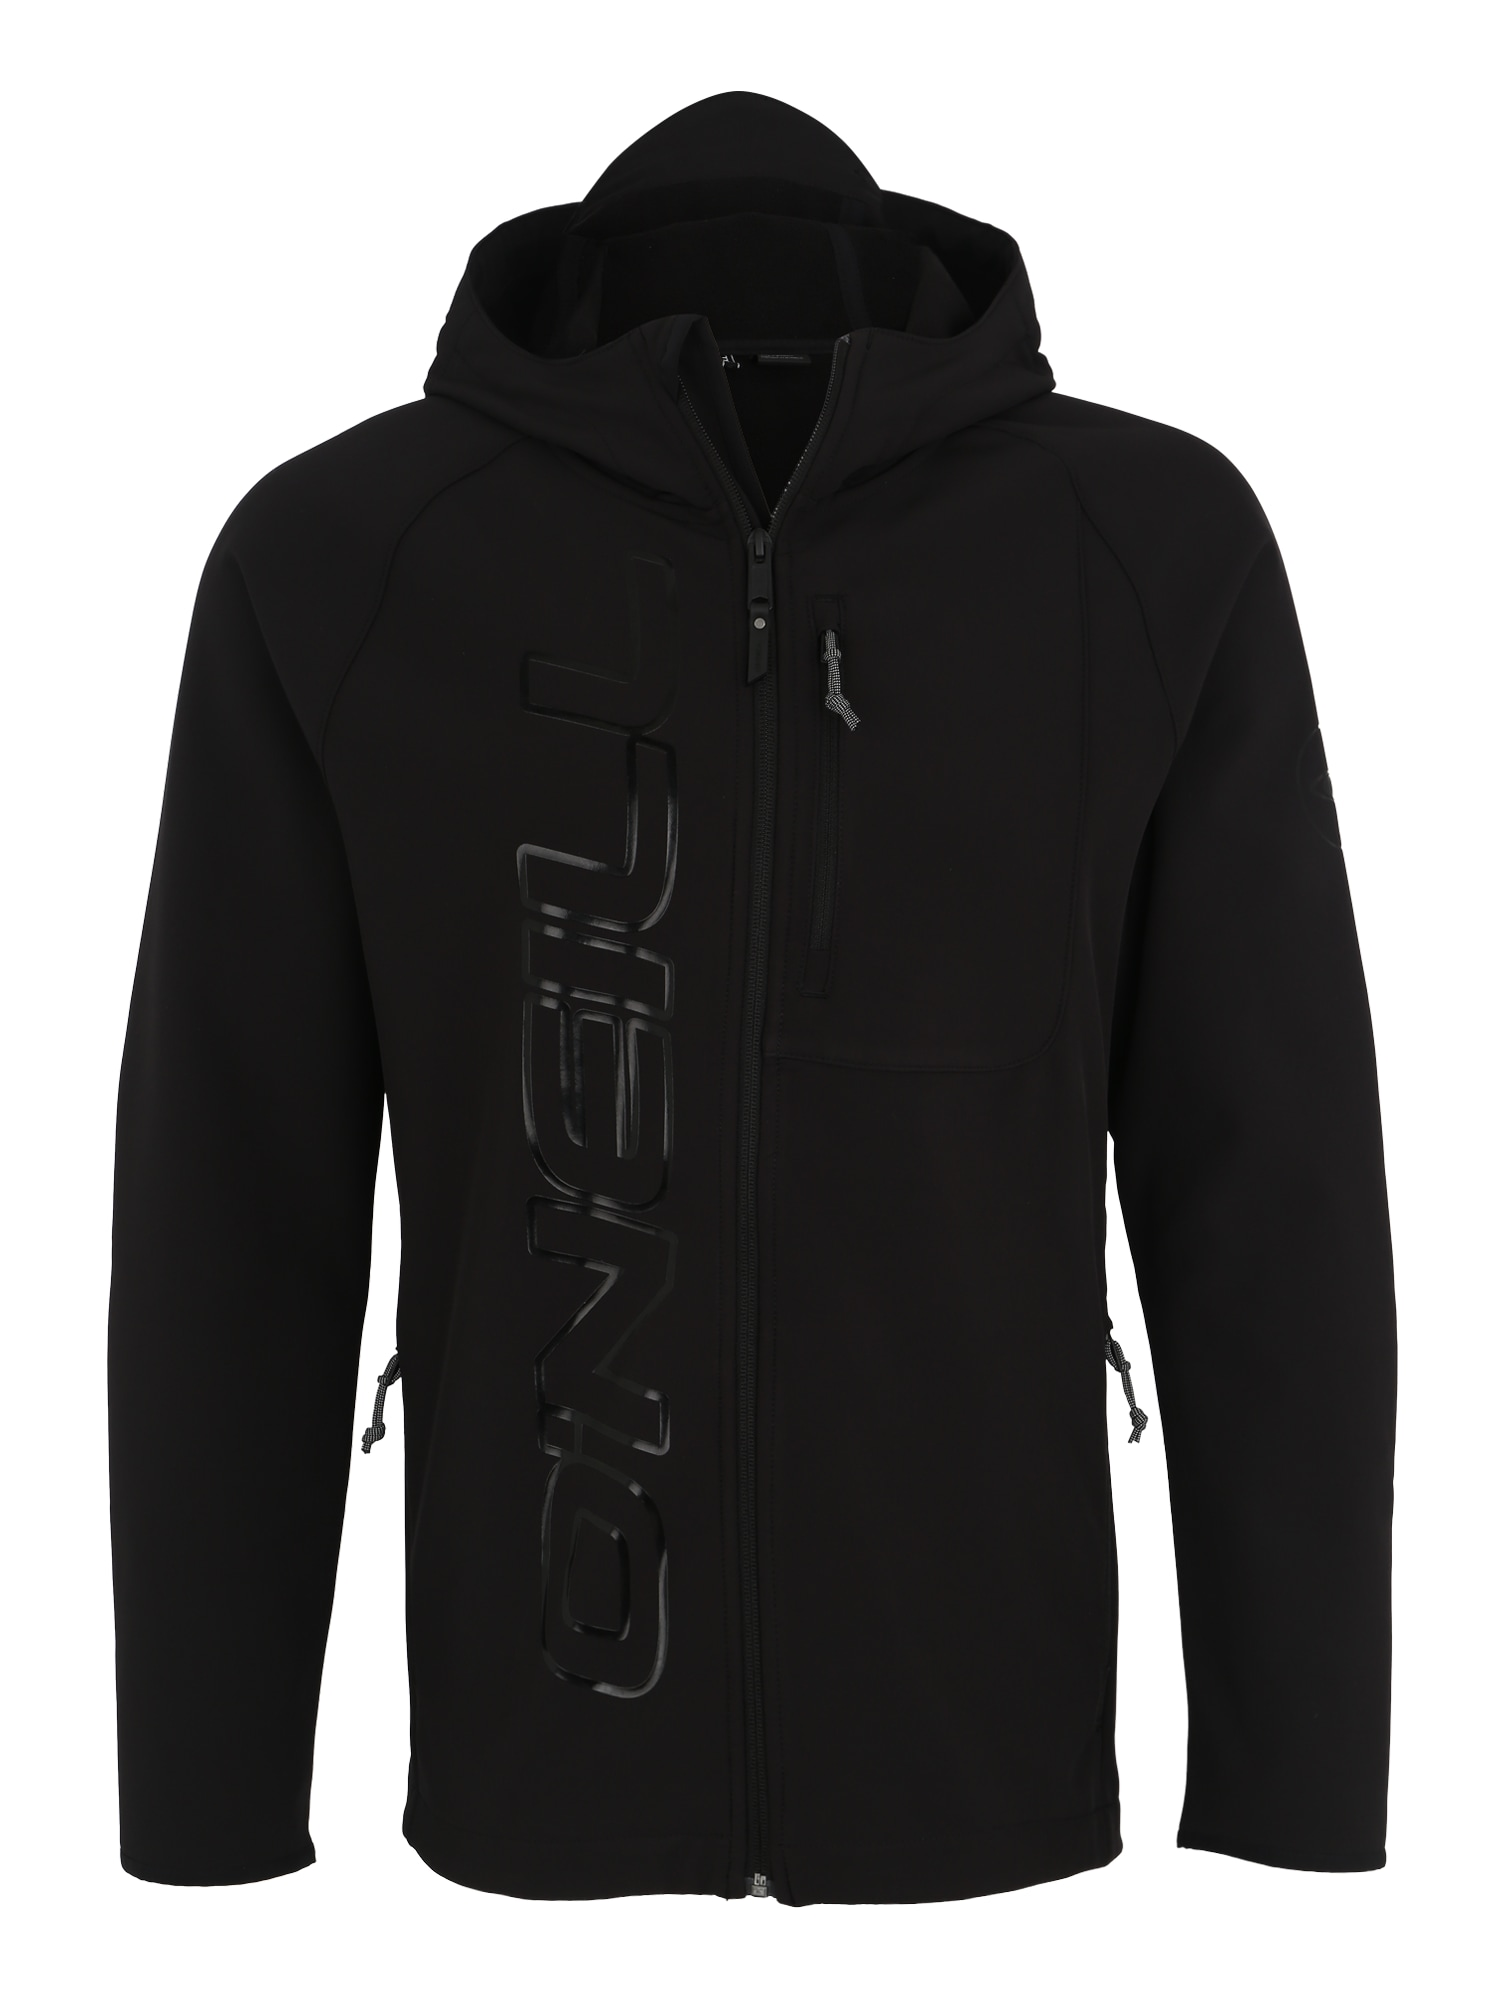 ONEILL Sportovní bunda Exile černá O'NEILL